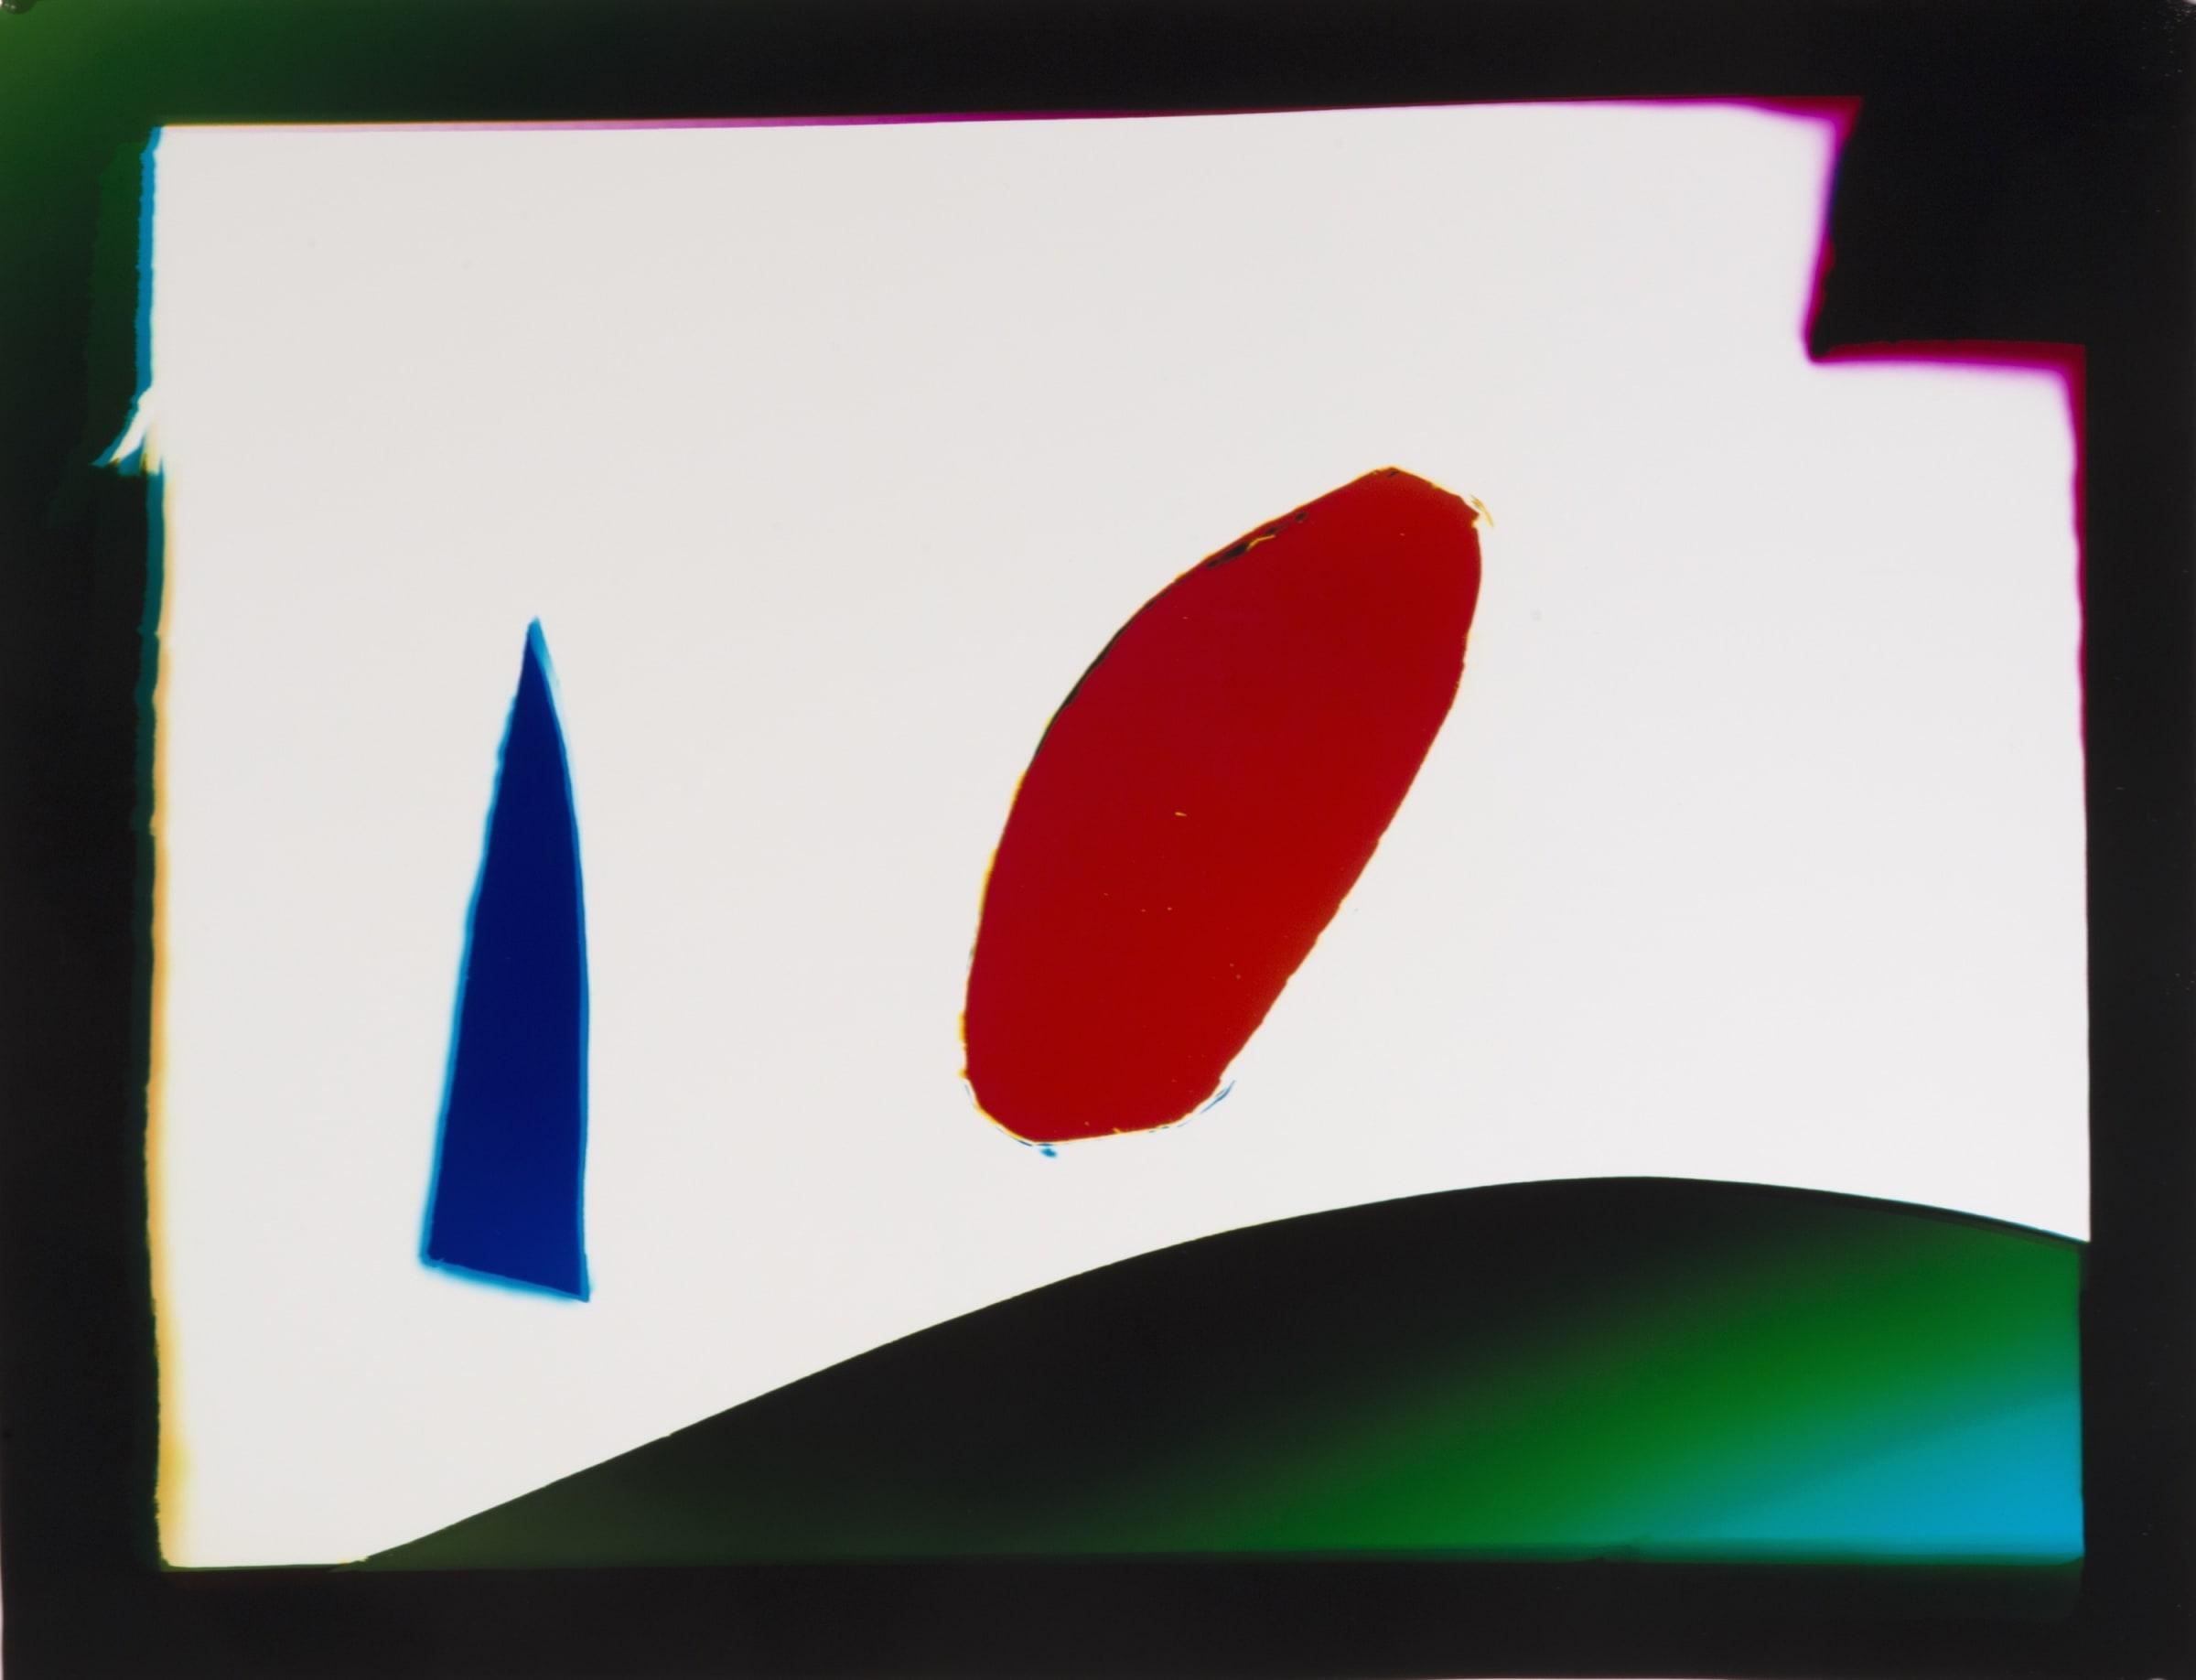 "<span class=""link fancybox-details-link""><a href=""/exhibitions/11/works/artworks119/"">View Detail Page</a></span><div class=""artist""><strong>Liz Nielsen</strong></div><div class=""title""><em>Day at the Park</em>, 2018</div><div class=""signed_and_dated"">Signed, titled and dated on artist's label</div><div class=""medium"">Analogue Chromogenic Photogram on Fujiflex, Unique</div><div class=""dimensions"">58 x 44.9 cm<br>18 x 23 in</div>"